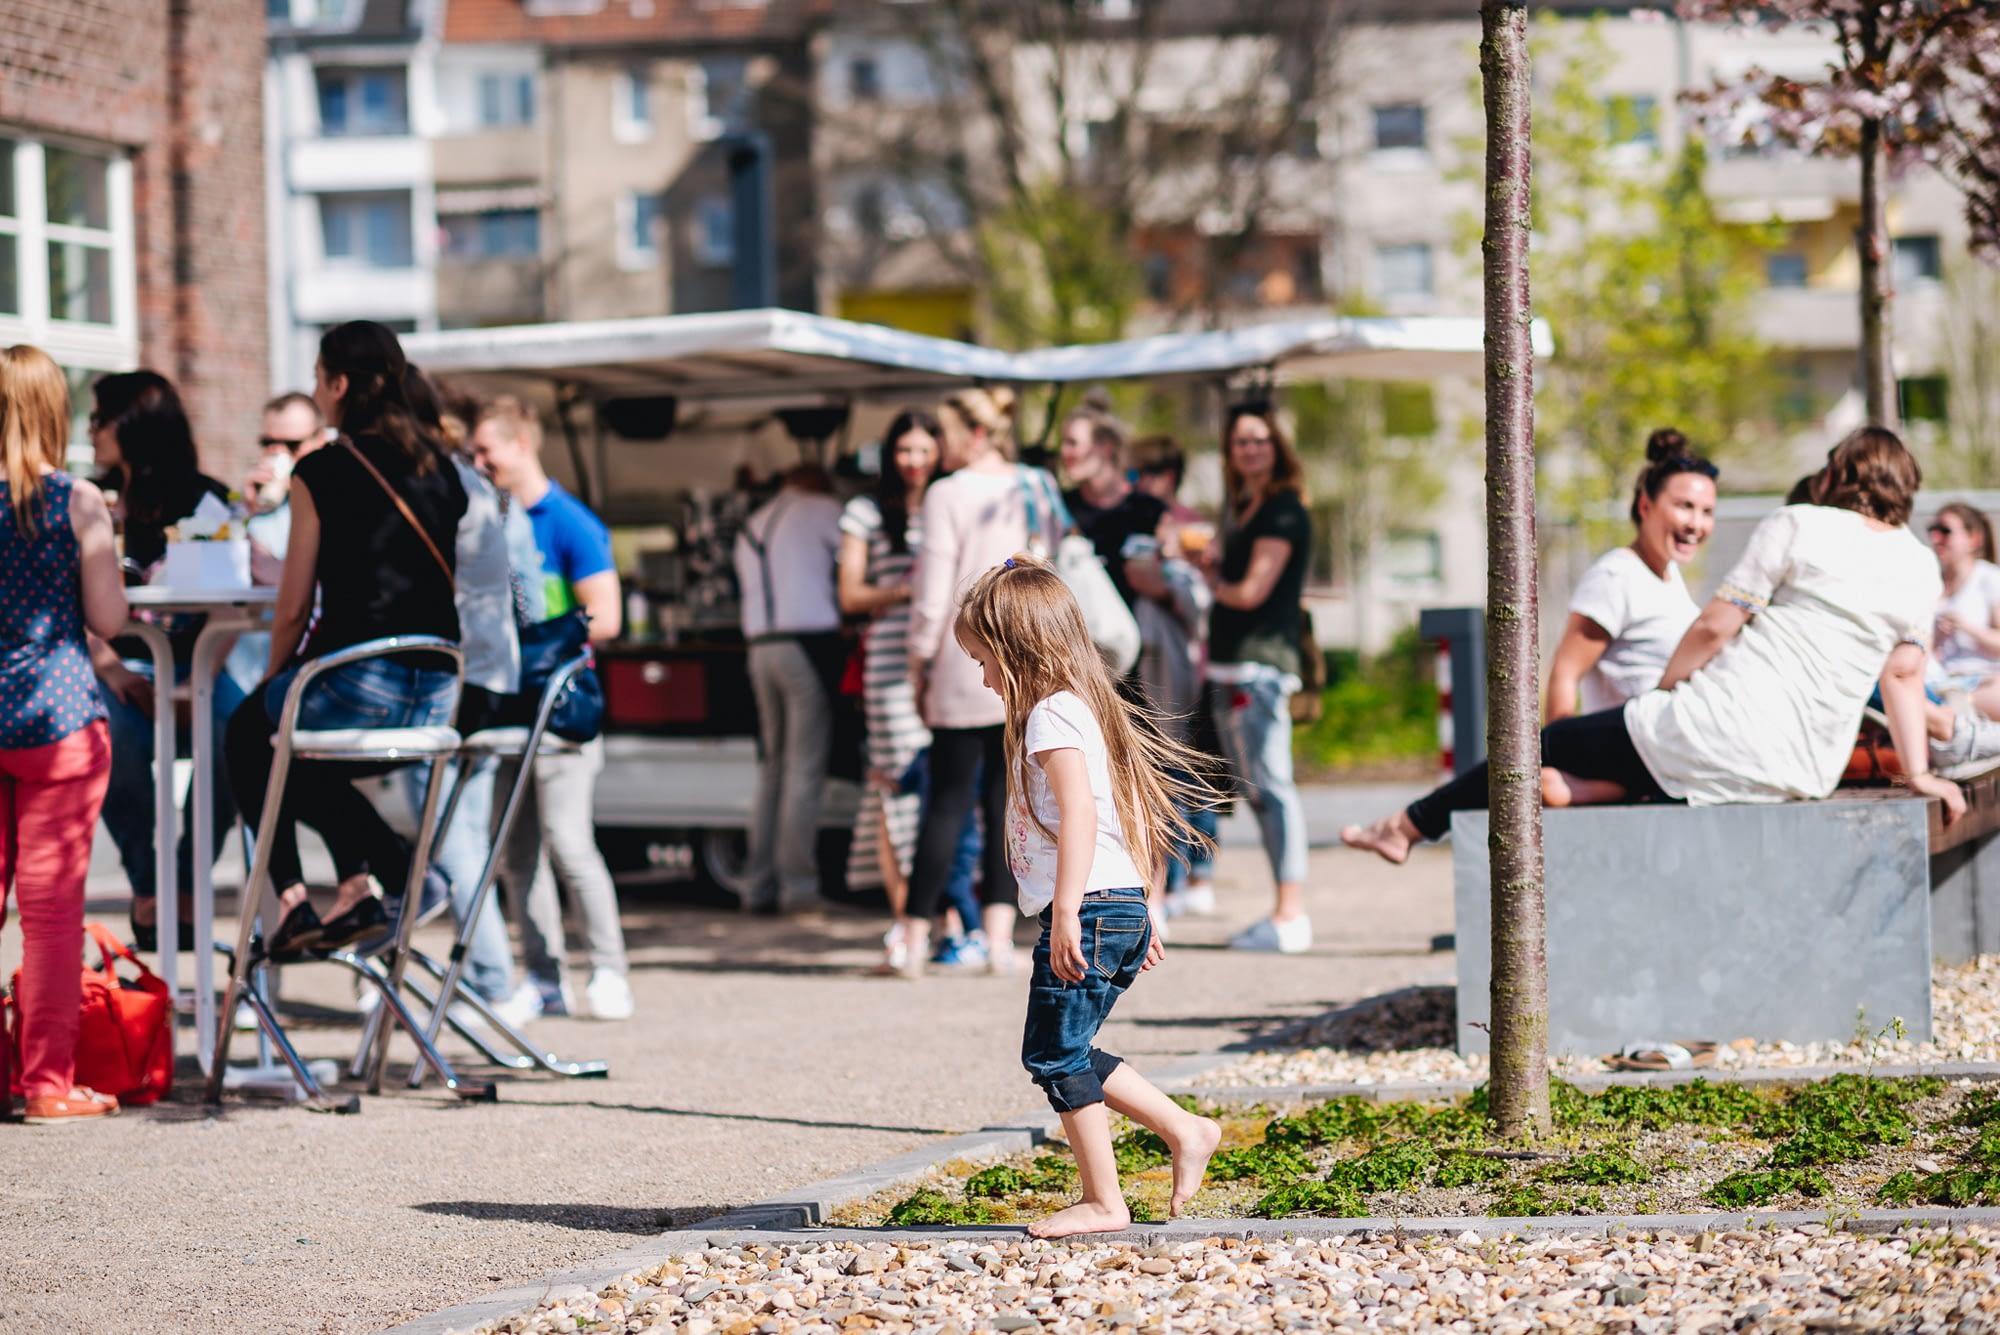 Eventfotograf Düsseldorf Christina Louise Photography